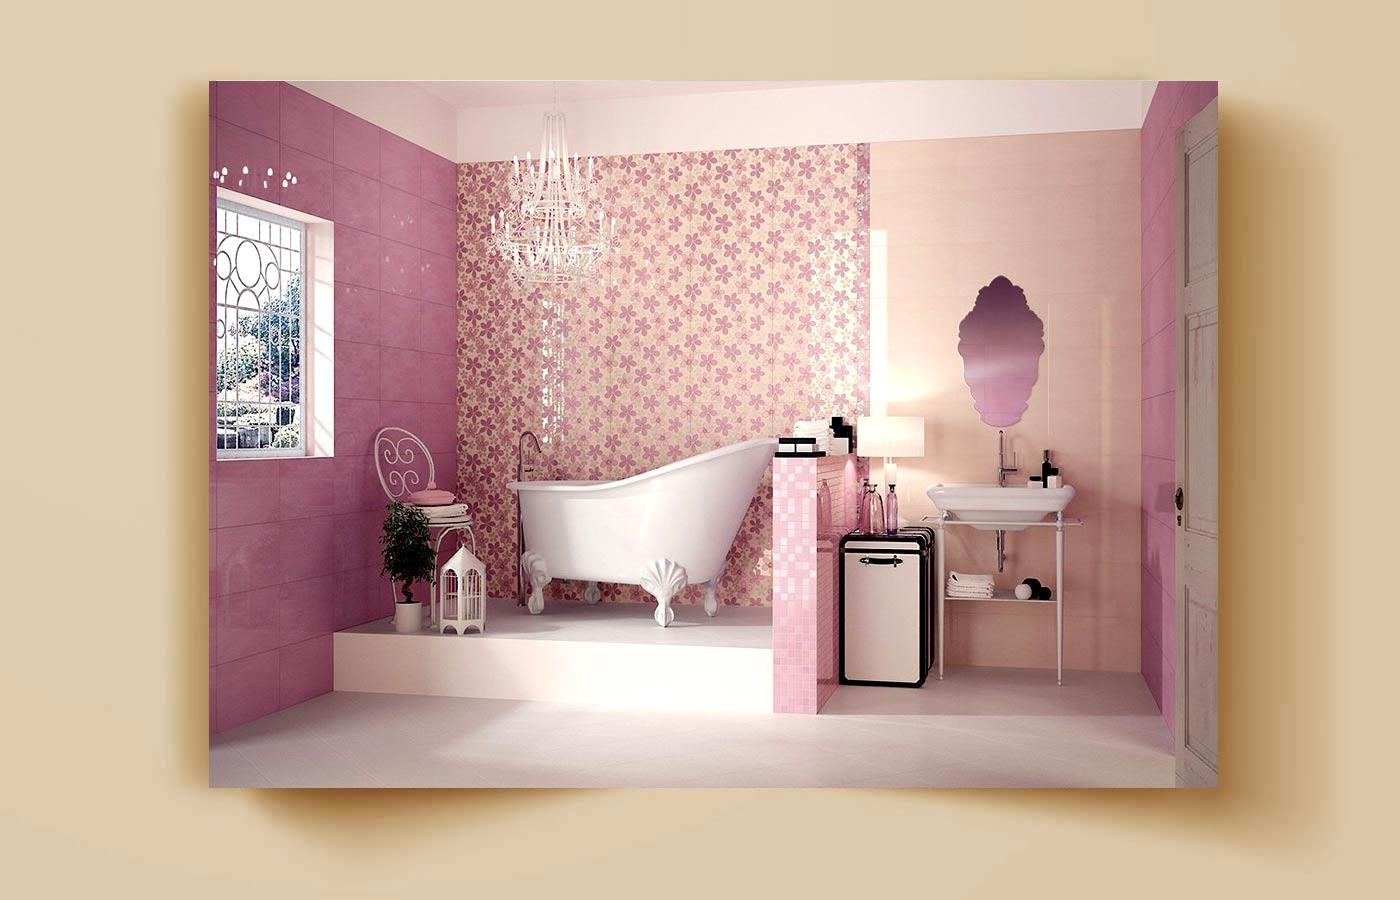 modern interior design 57 - خانه را با وجود لوازم ارزان، لوکس و گران نشان دهید